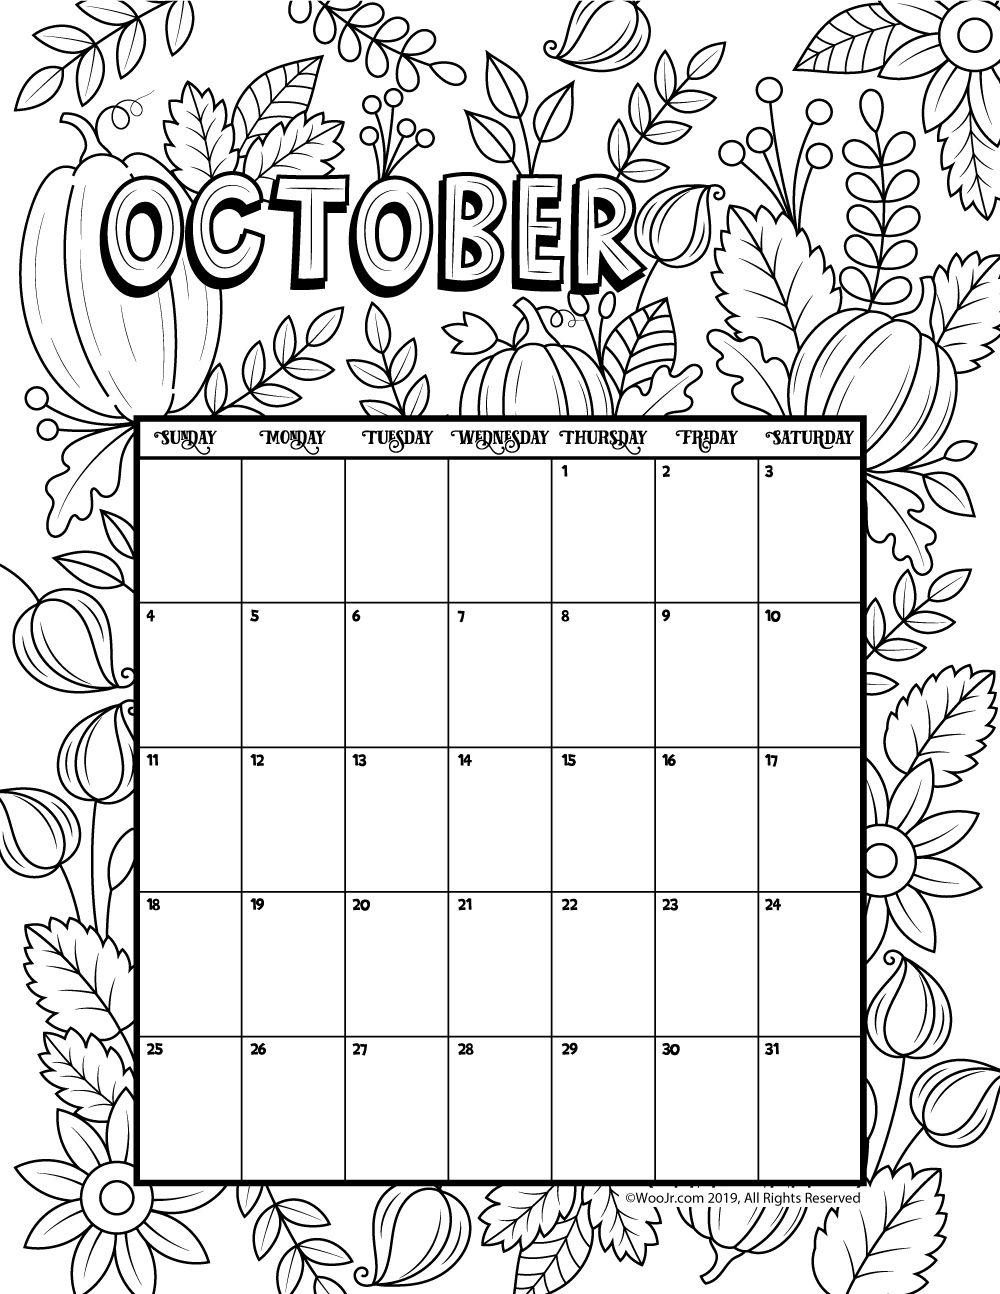 October 2020 Coloring Calendar | Printable coloring ...